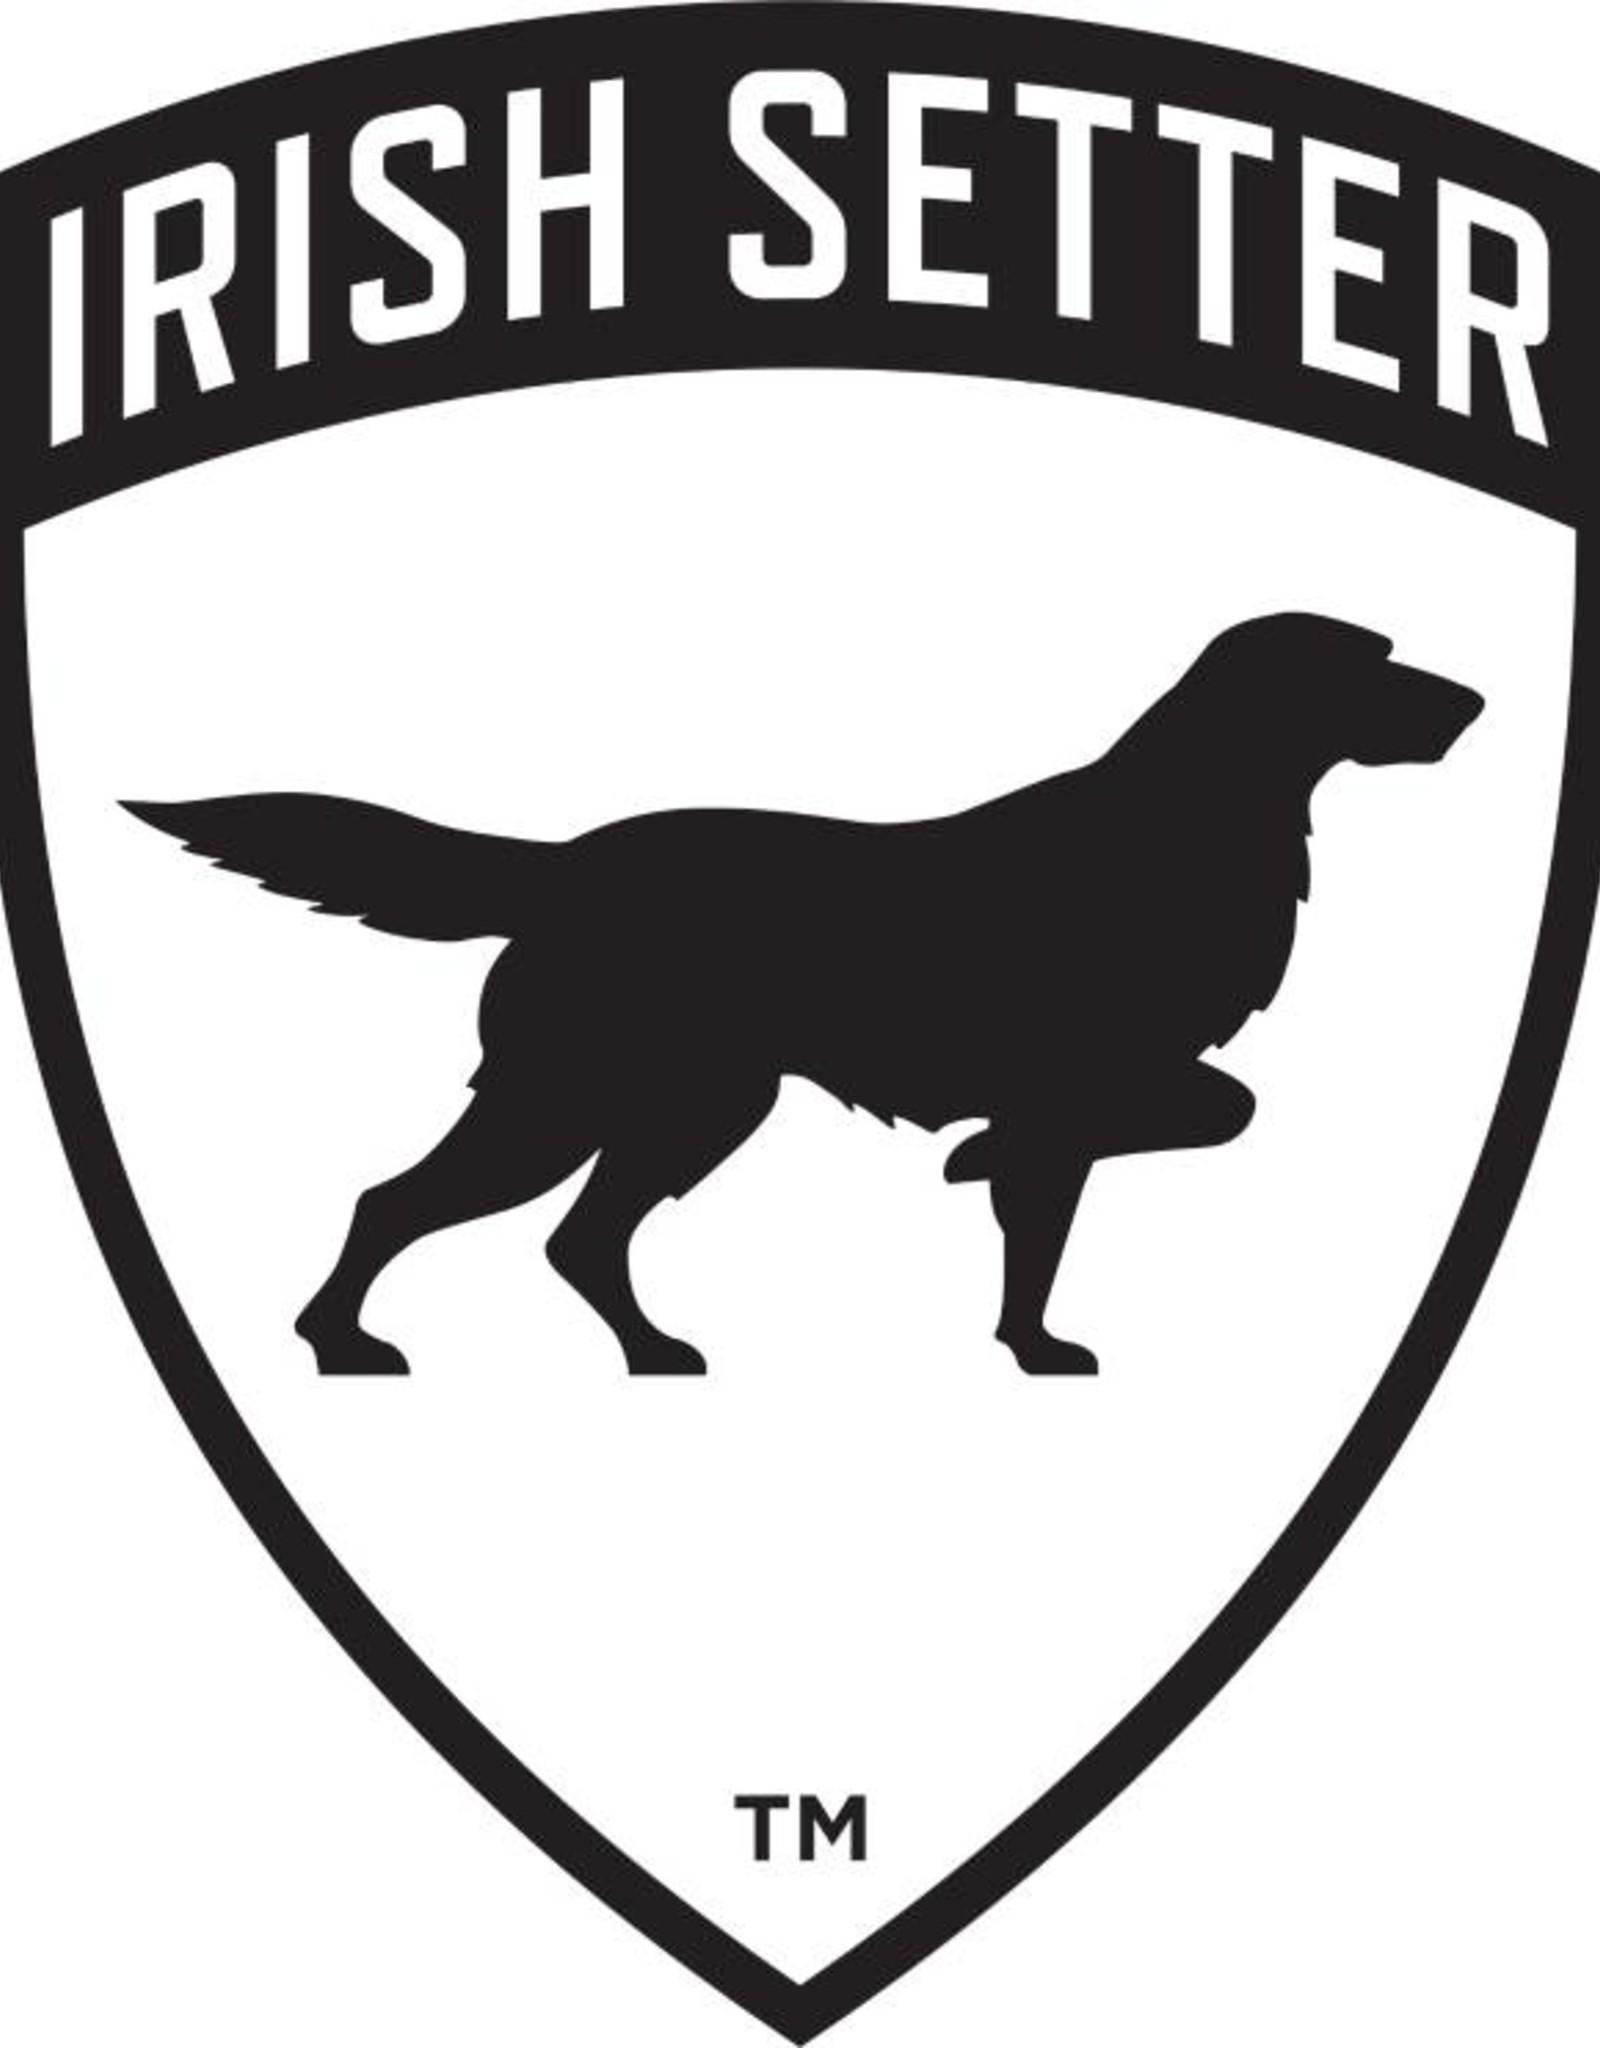 Redwing Irish Setter Elk Tracker 860 1000 gram